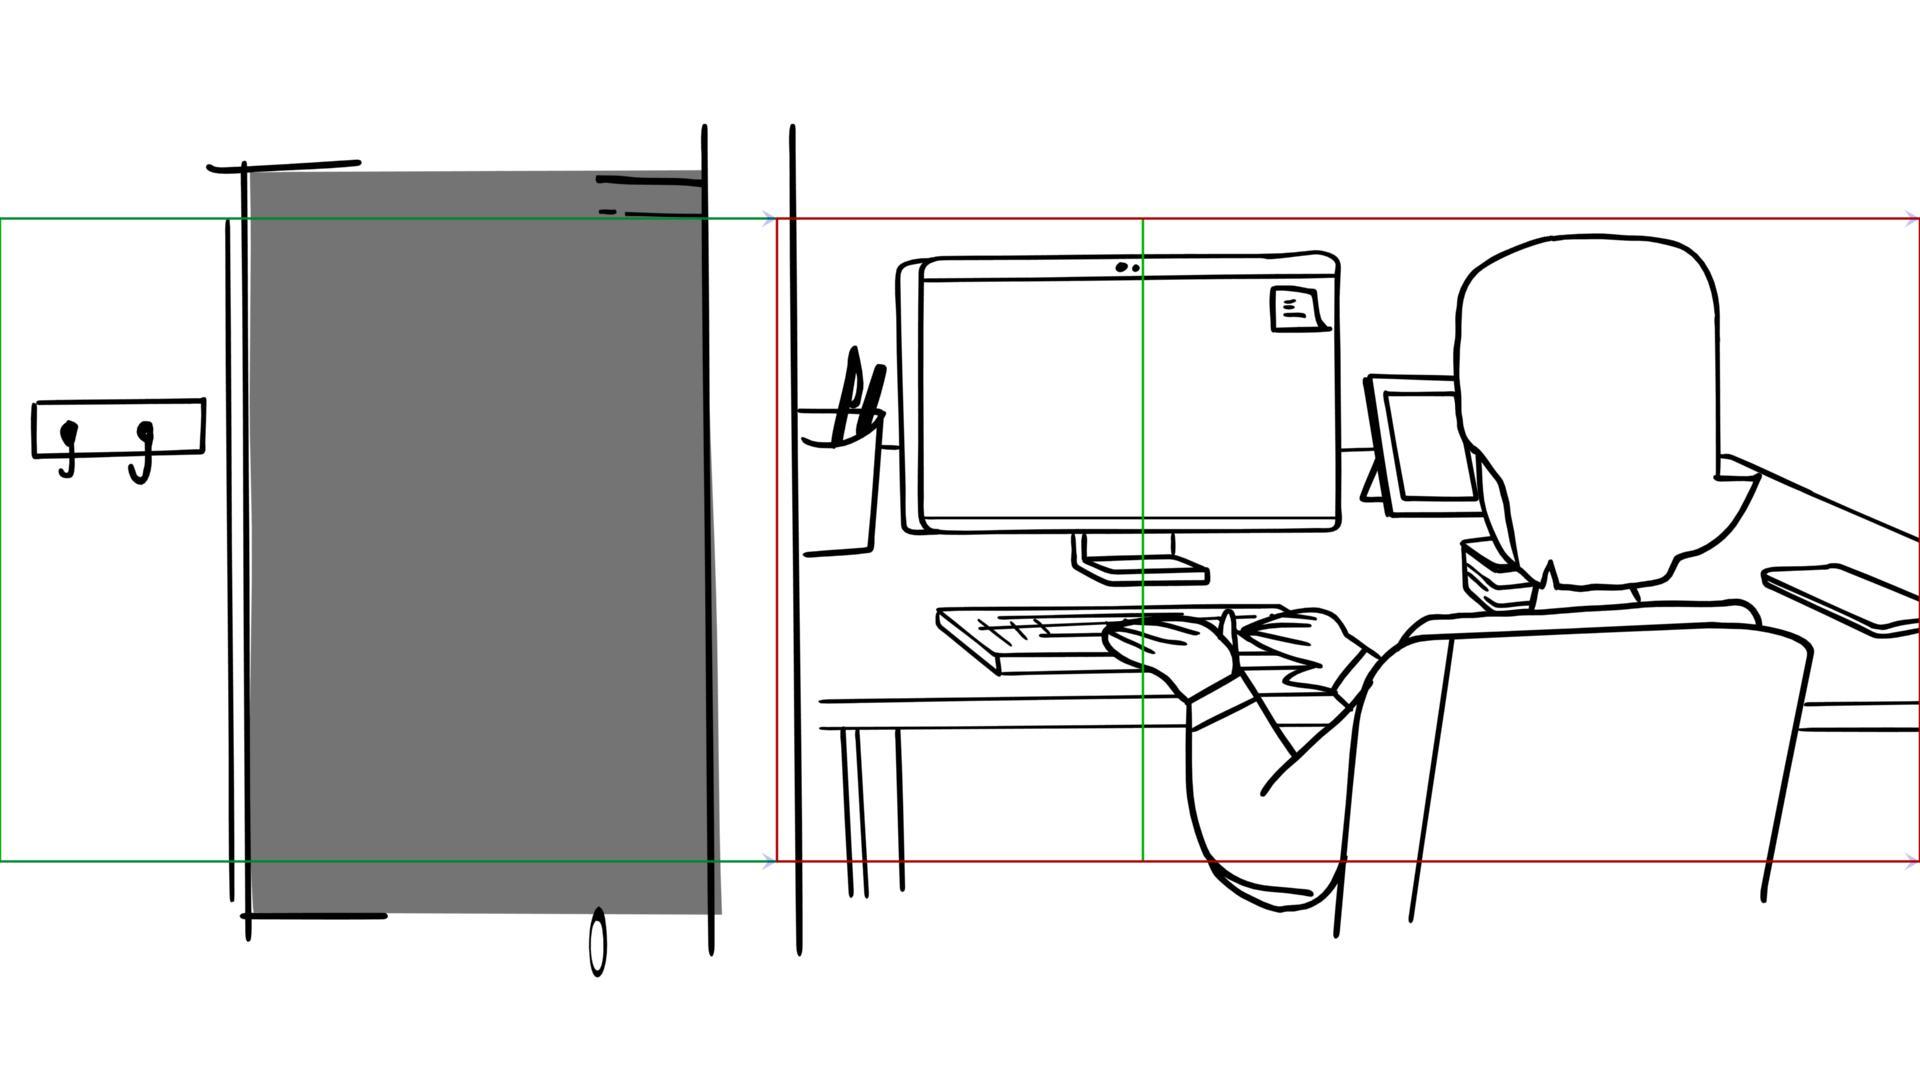 Medici_Storyboards_01-000000001-68.jpg